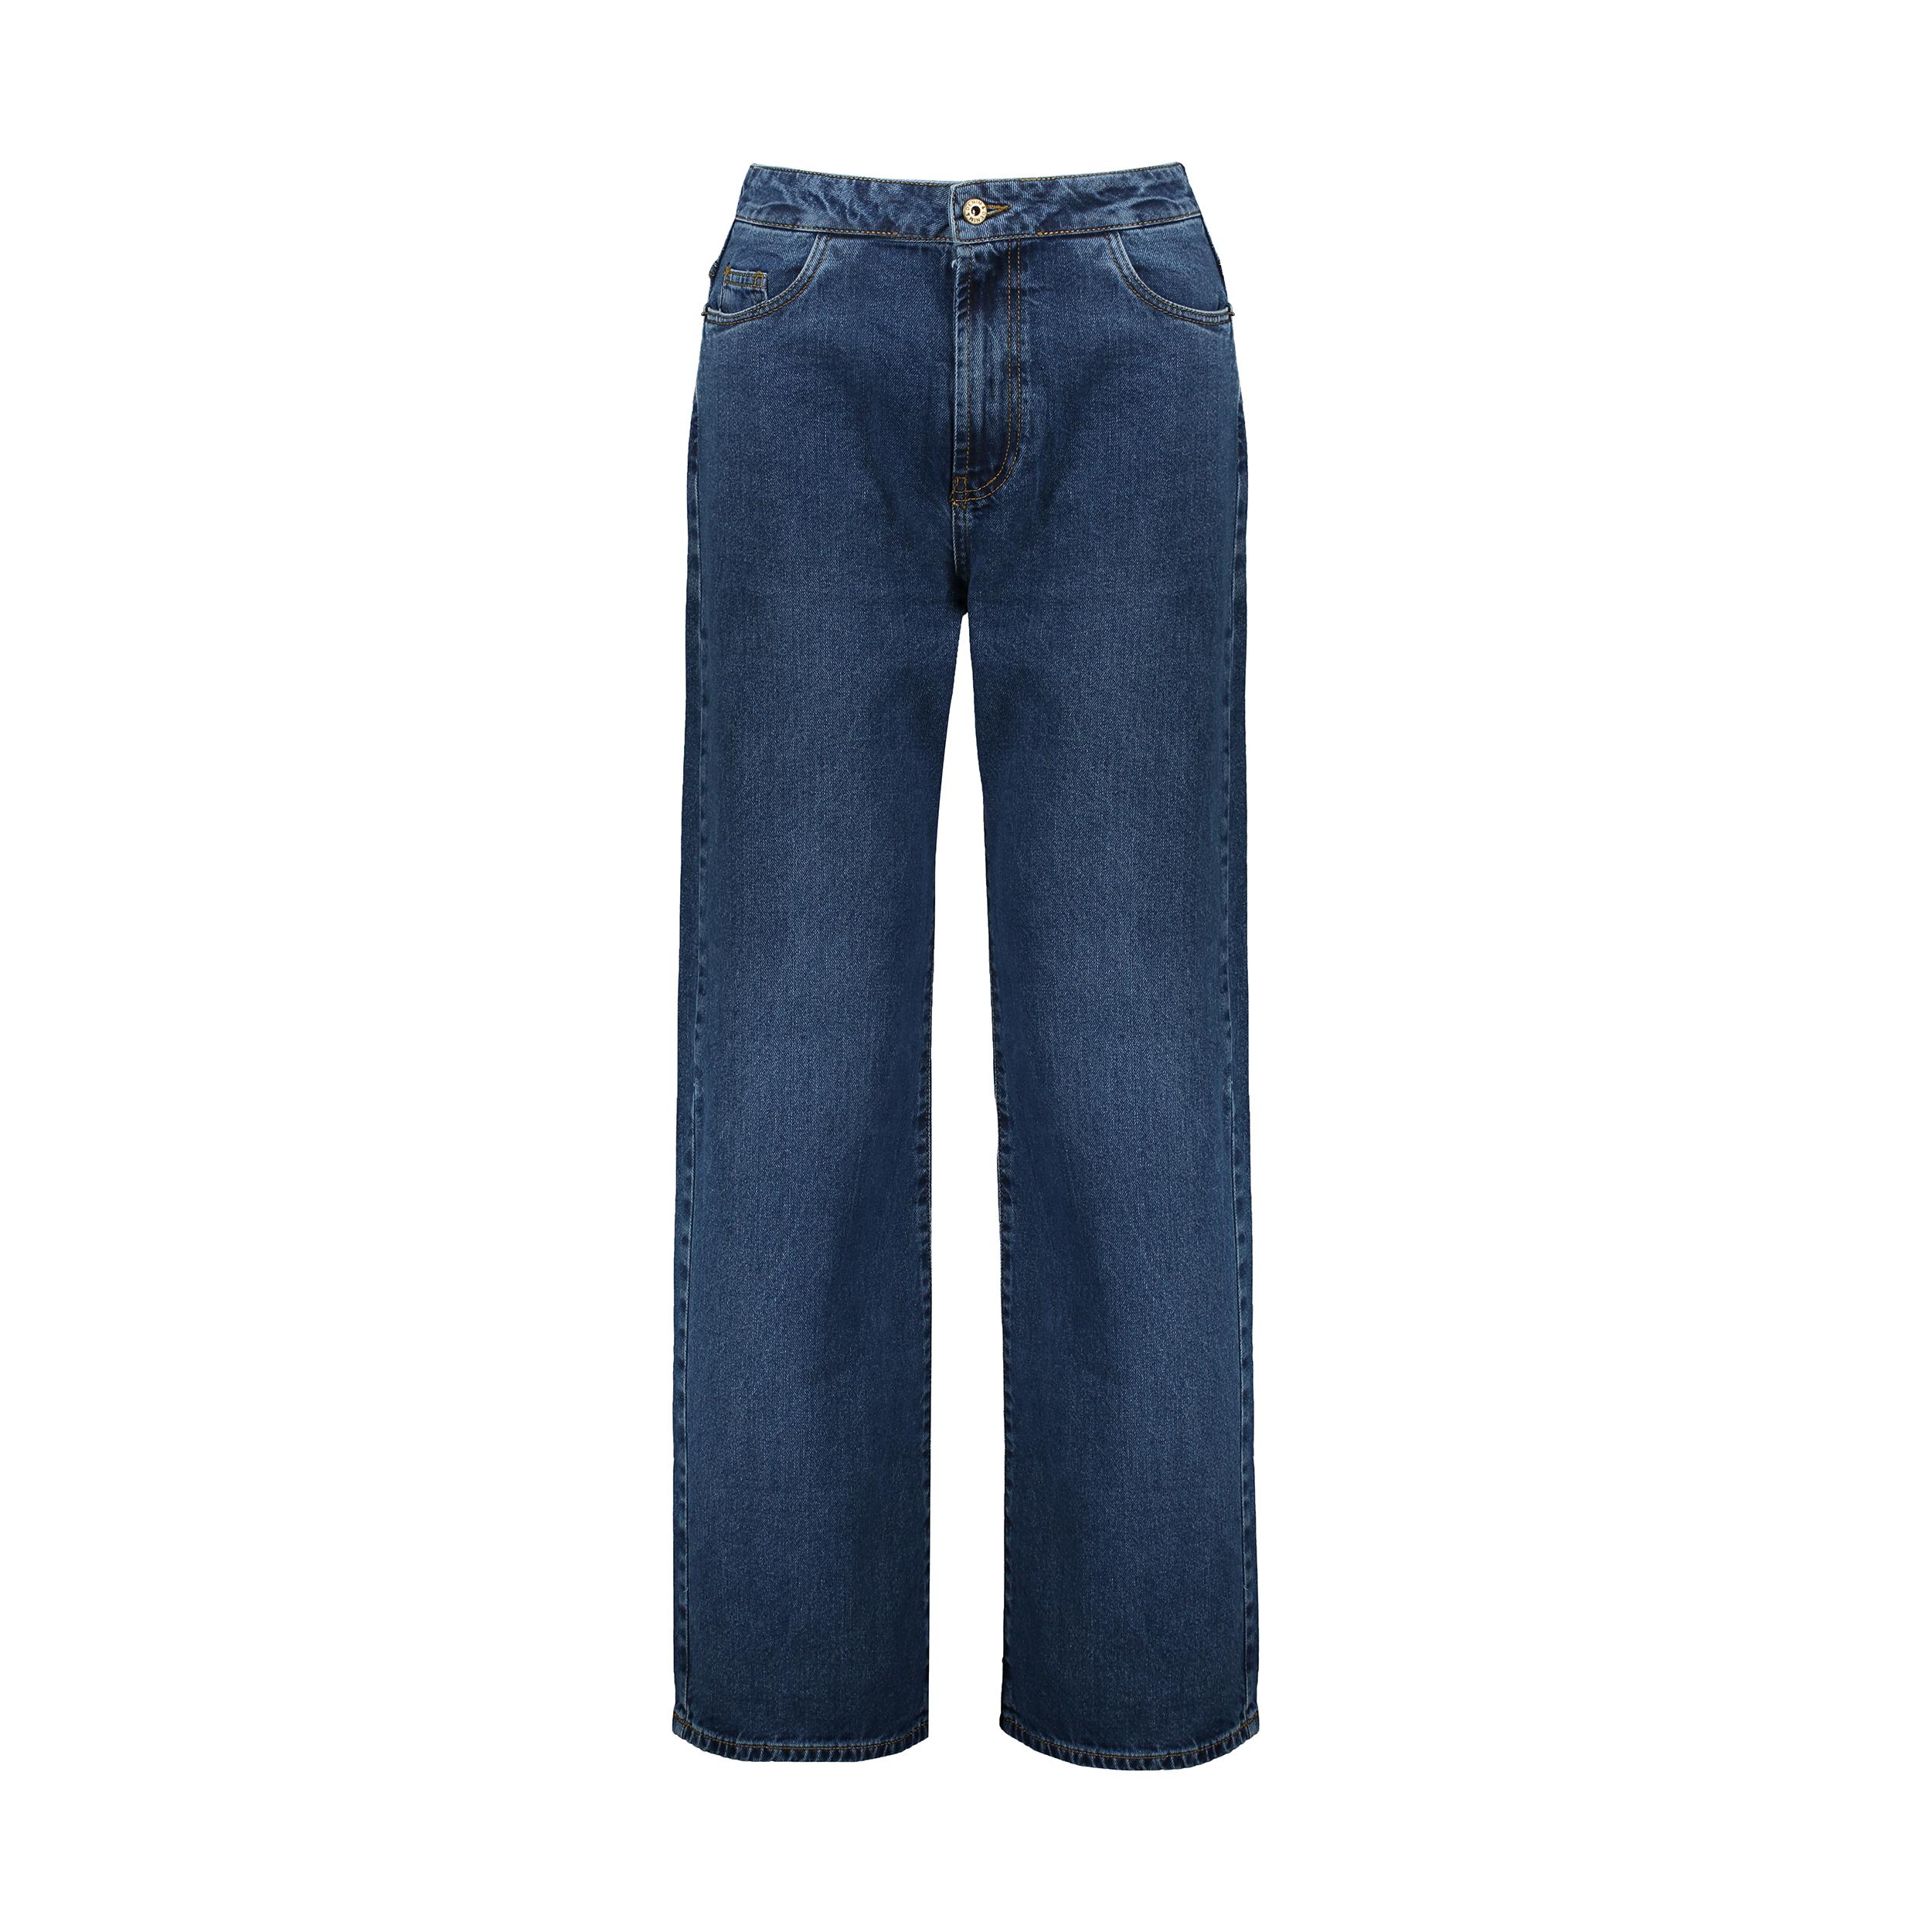 شلوار جین زنانه برنس مدل LIYAM-77